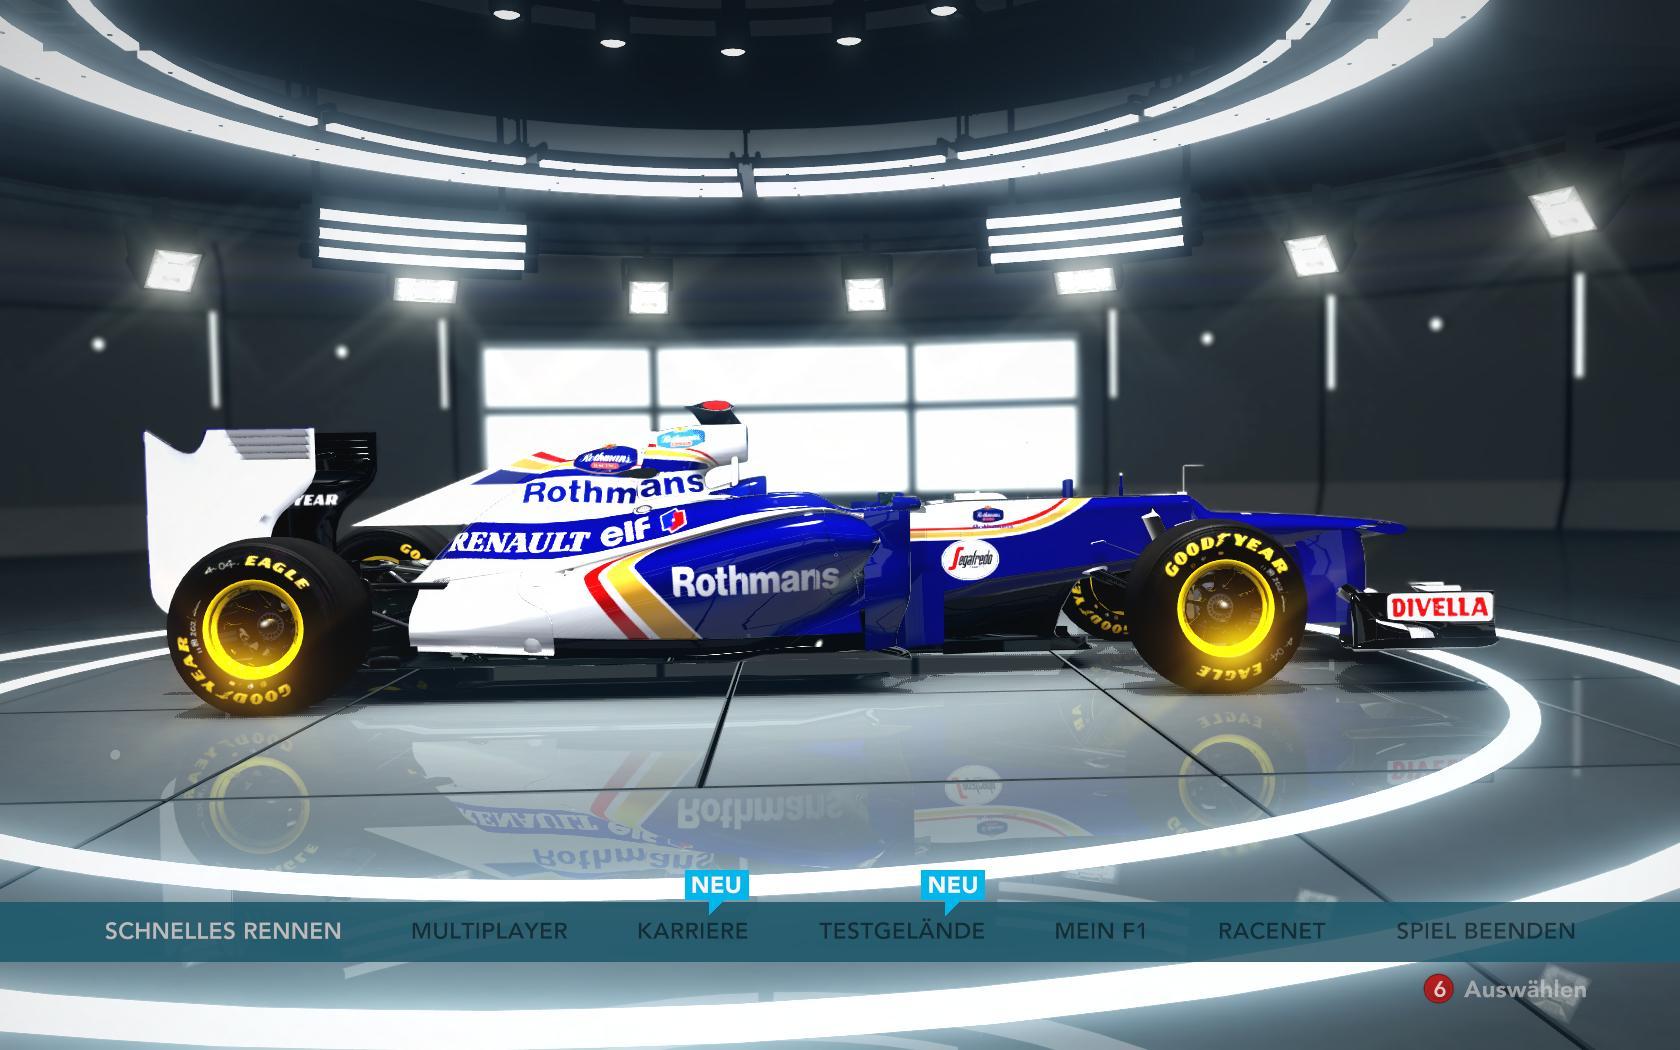 1994-Williams-car.jpg